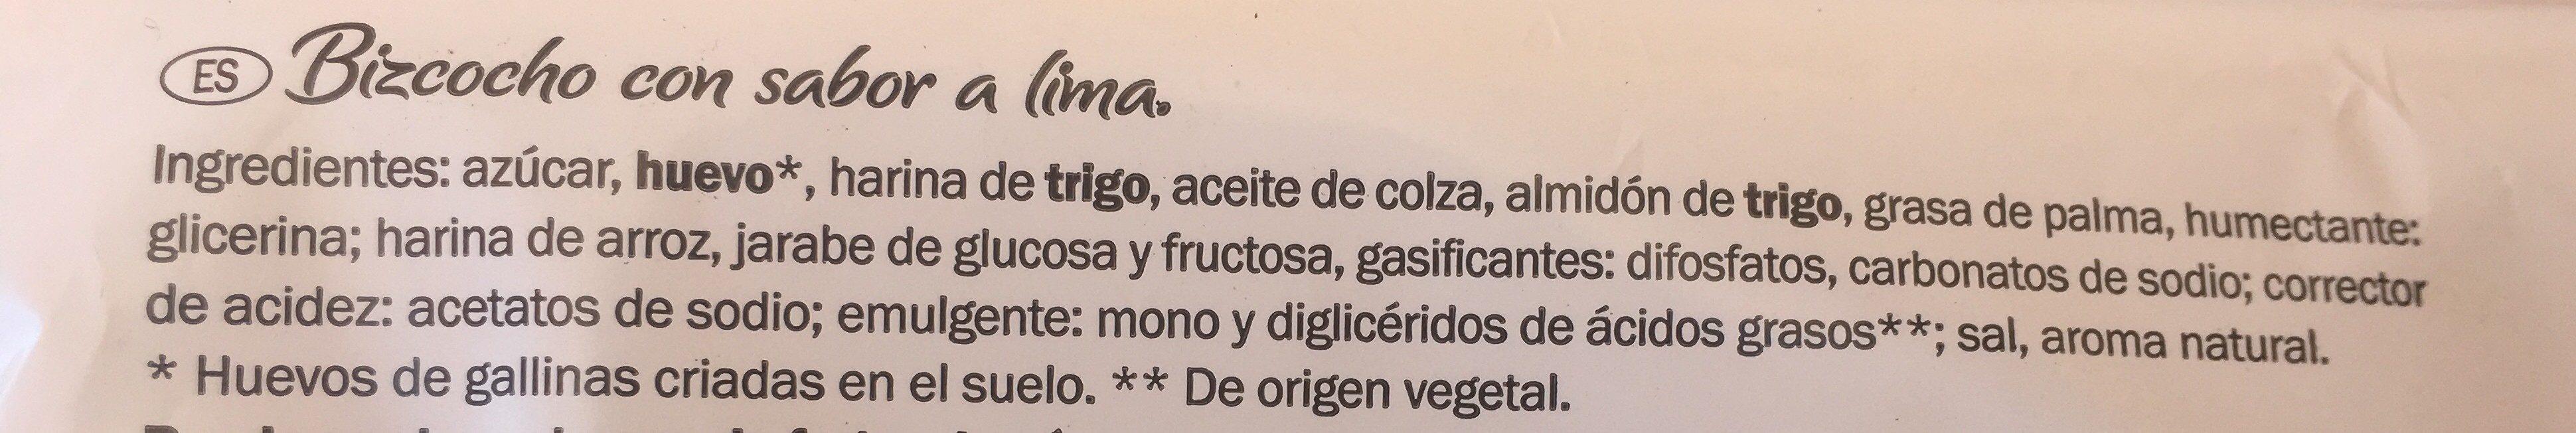 Bizcocho con sabot a lima - Ingrédients - fr